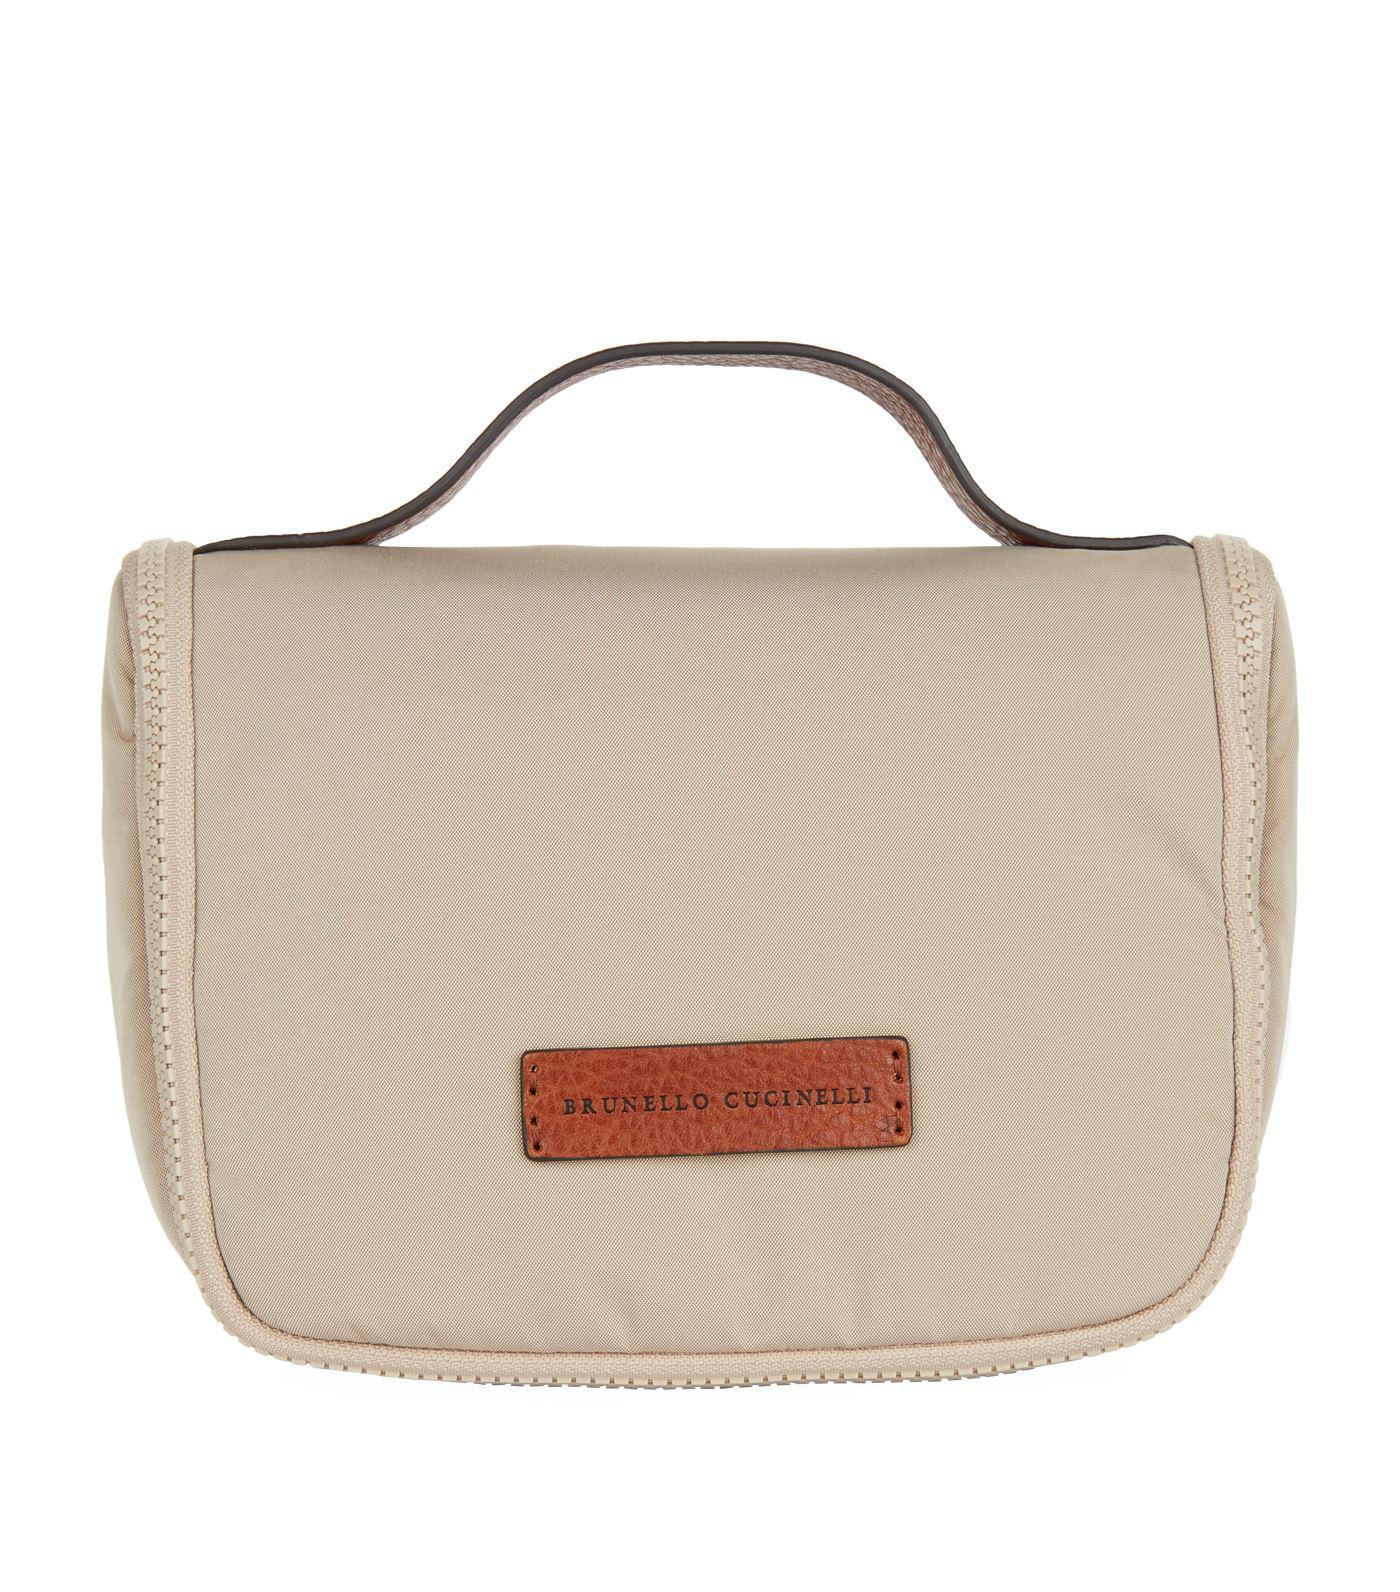 508cab4d2de7 Brunello Cucinelli - Natural Travel Wash Bag for Men - Lyst. View fullscreen